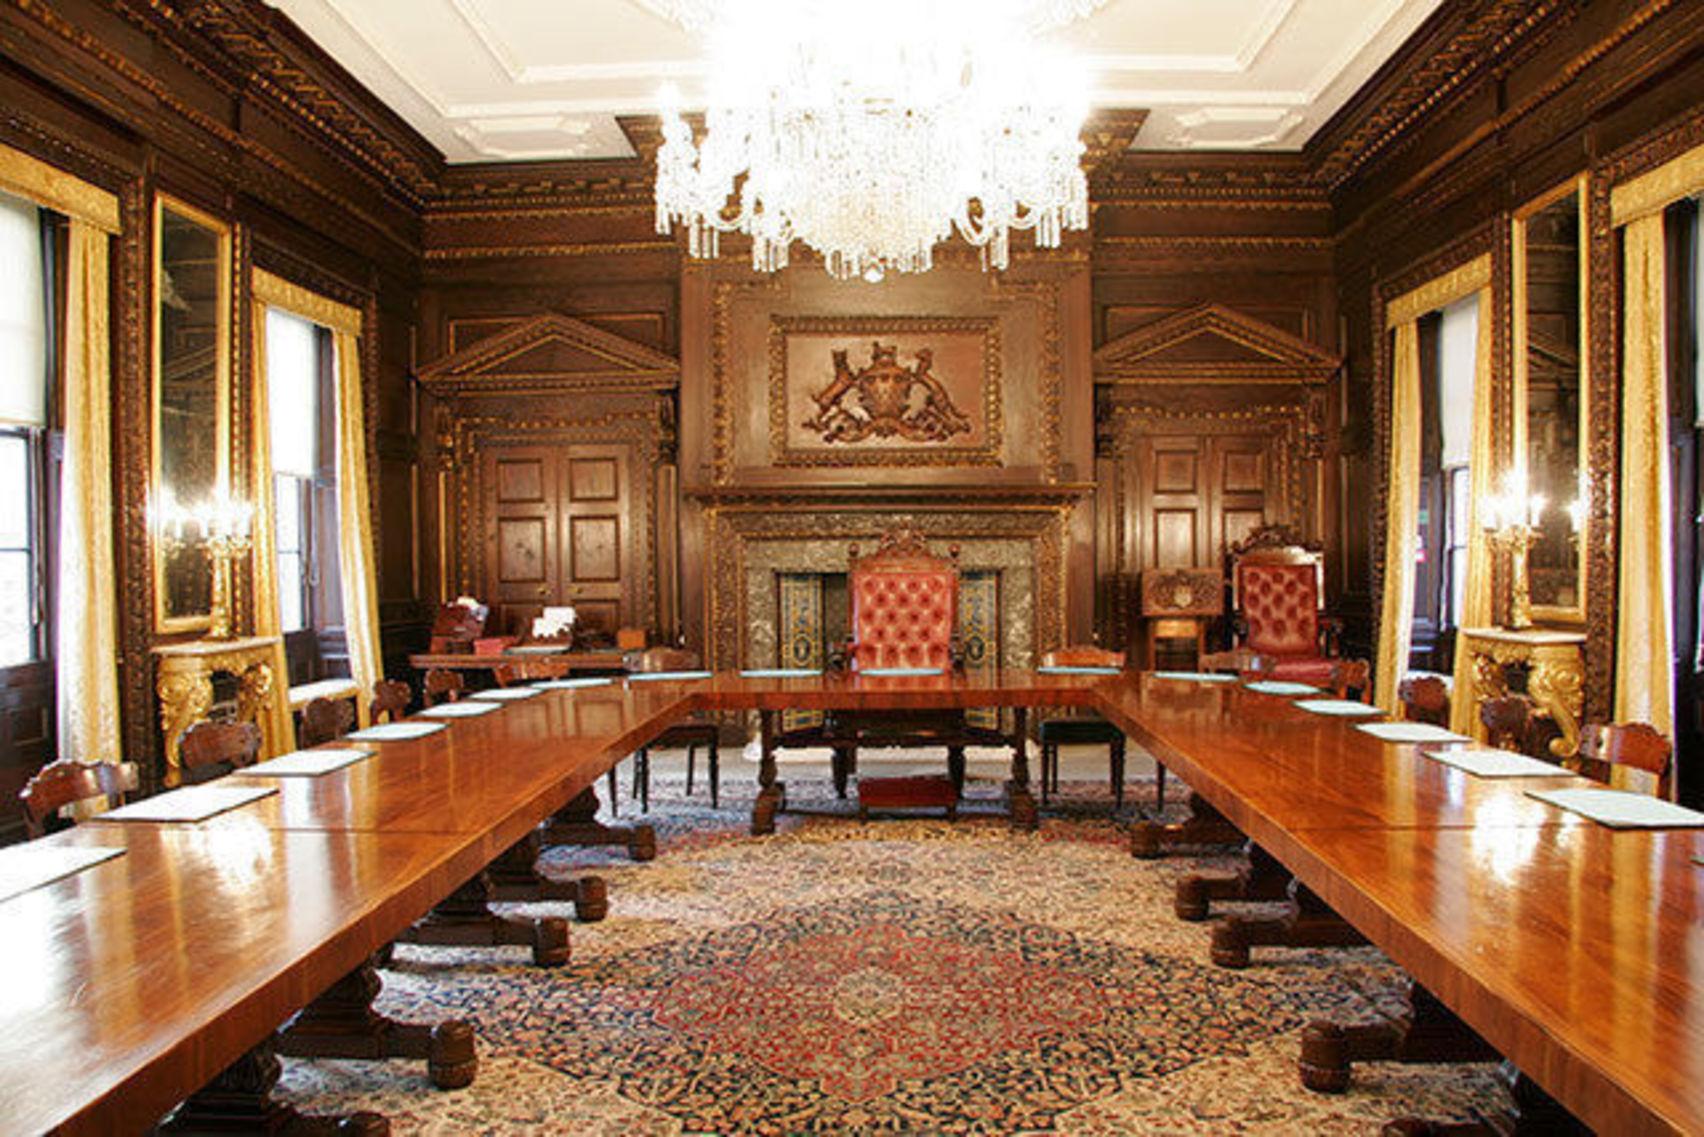 Court Room, Skinners Hall